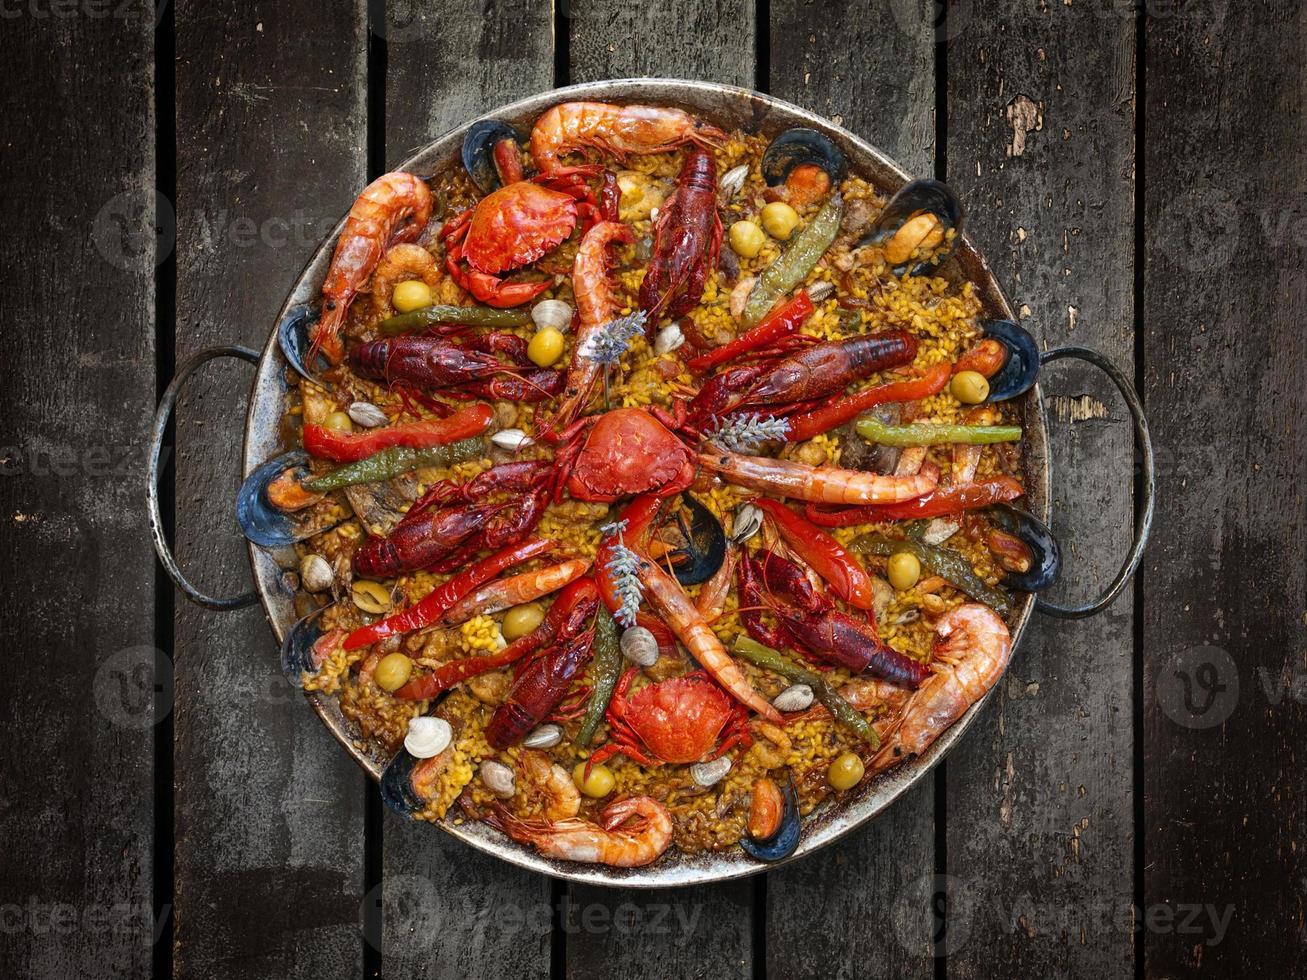 Spaanse traditionele paella met zeevruchten foto